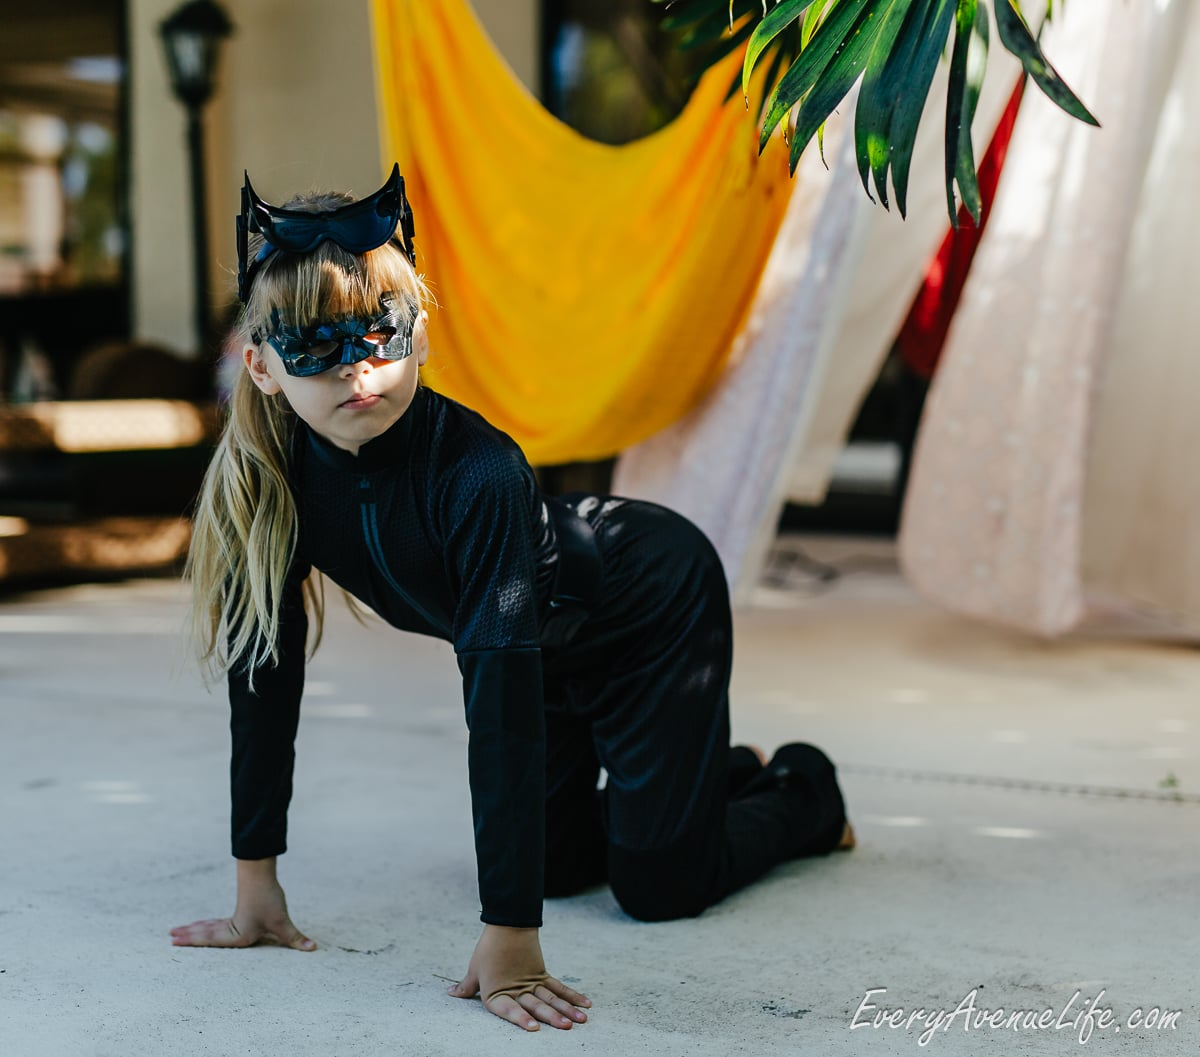 Moms blogging every avenue life Halloween catgirl costume